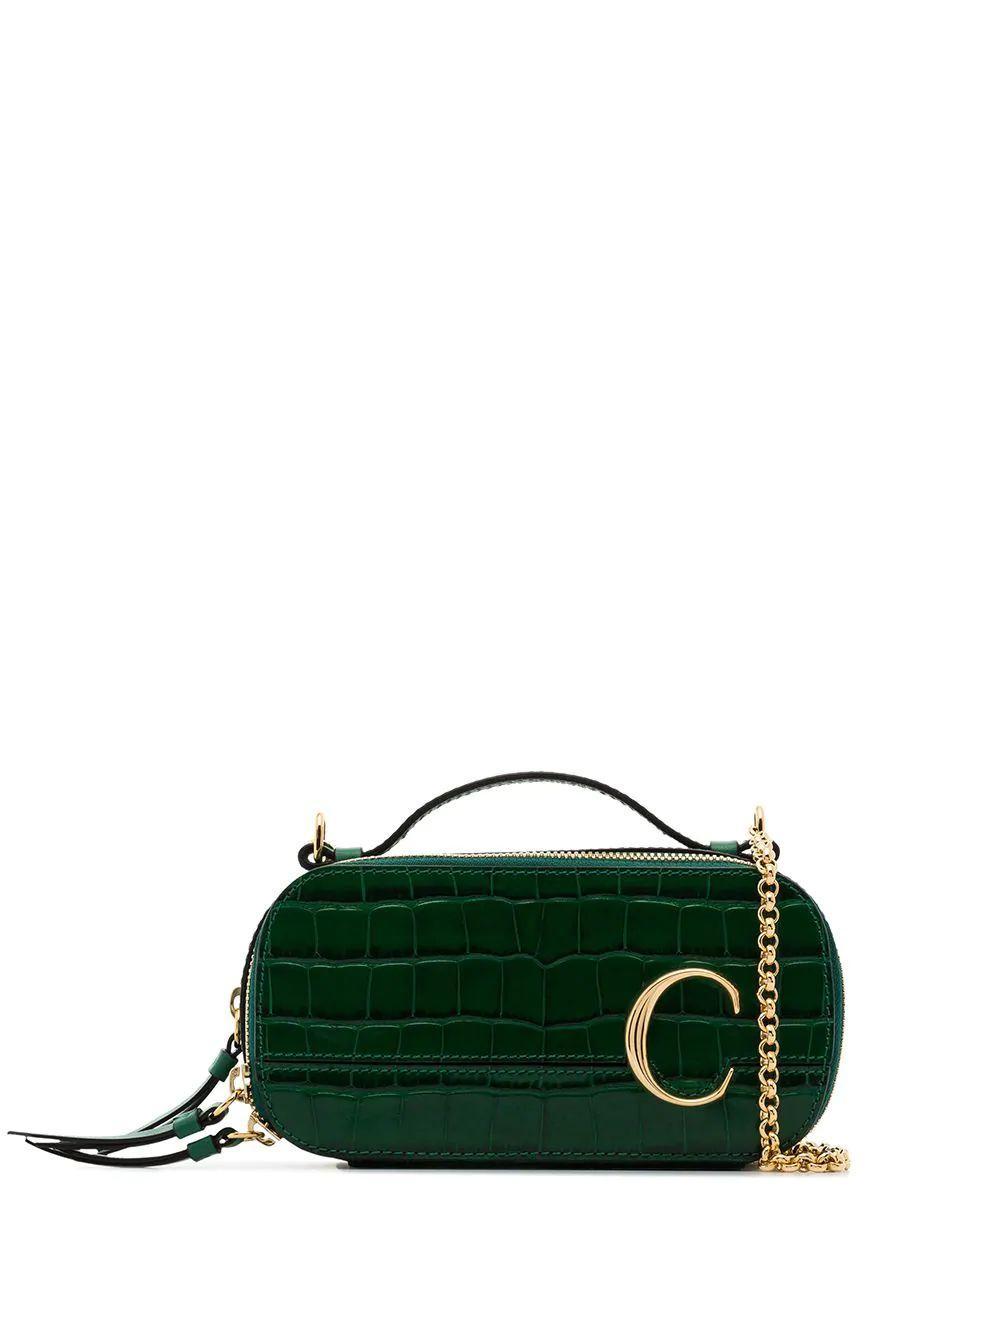 Chloe C Embossed Crocodile Compact Bag Item # CHC20SS225A873H0